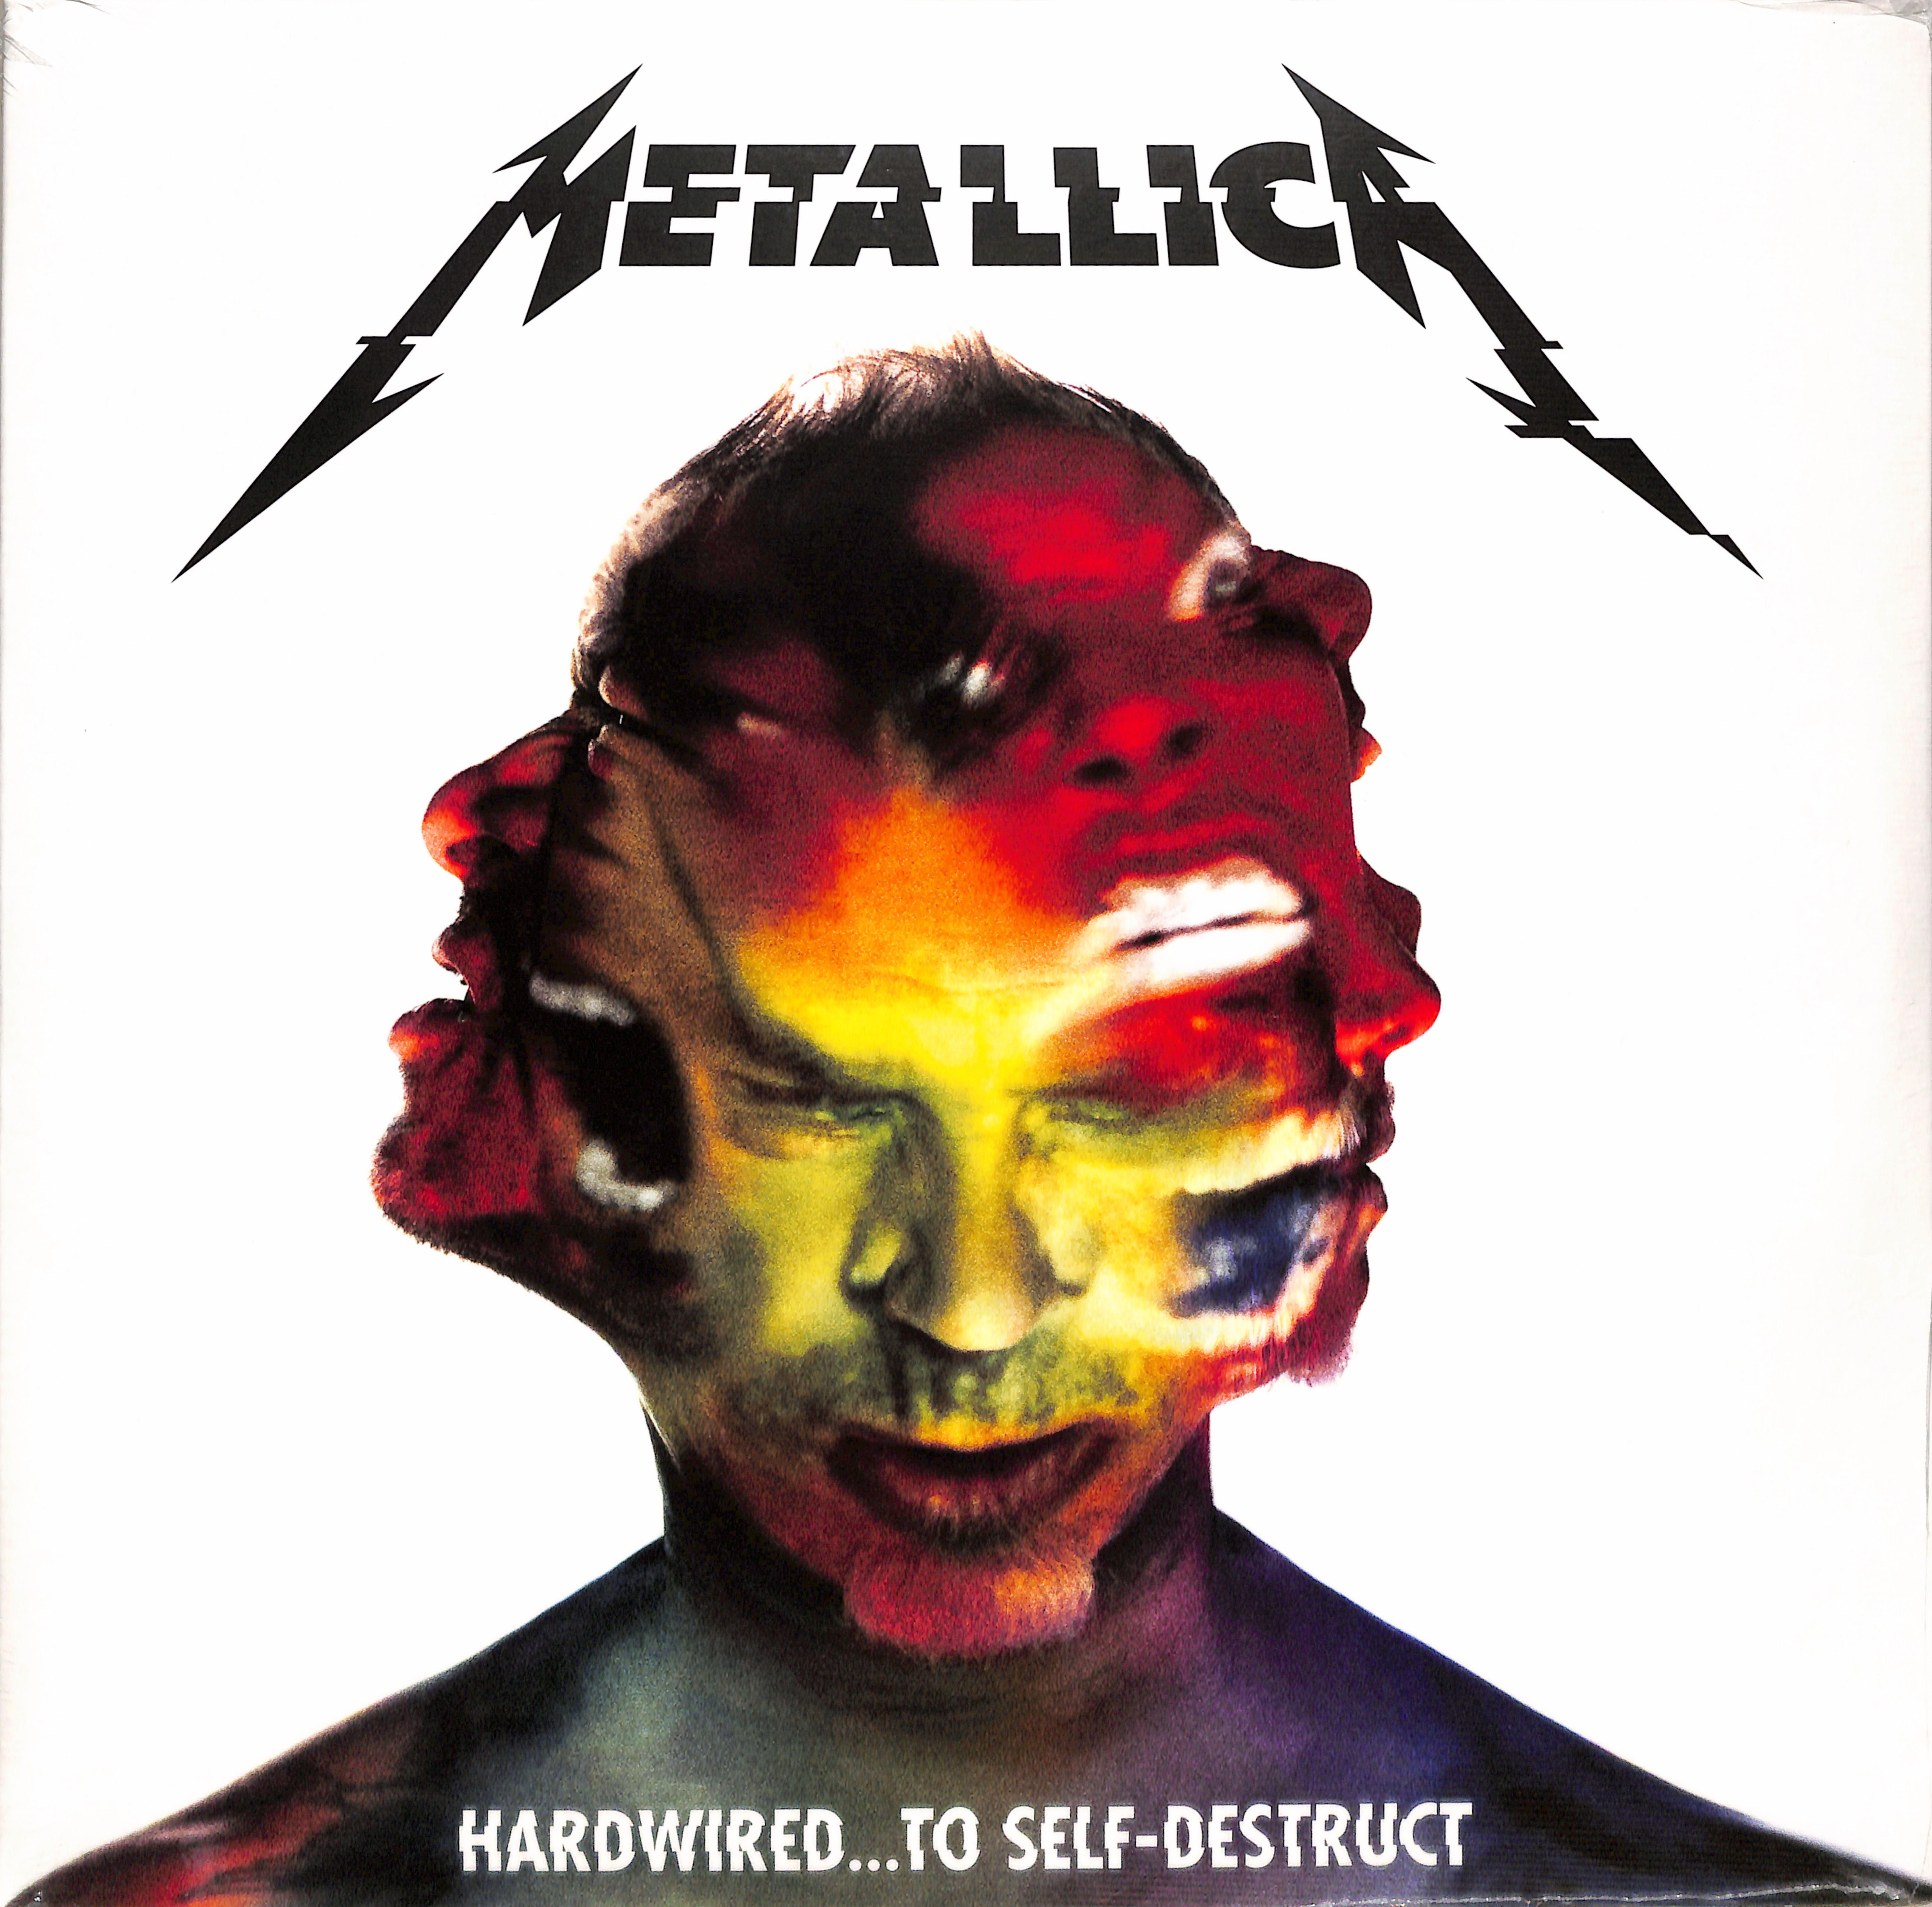 Metallica - HARDWIRED ... TO SELF-DESTRUCT